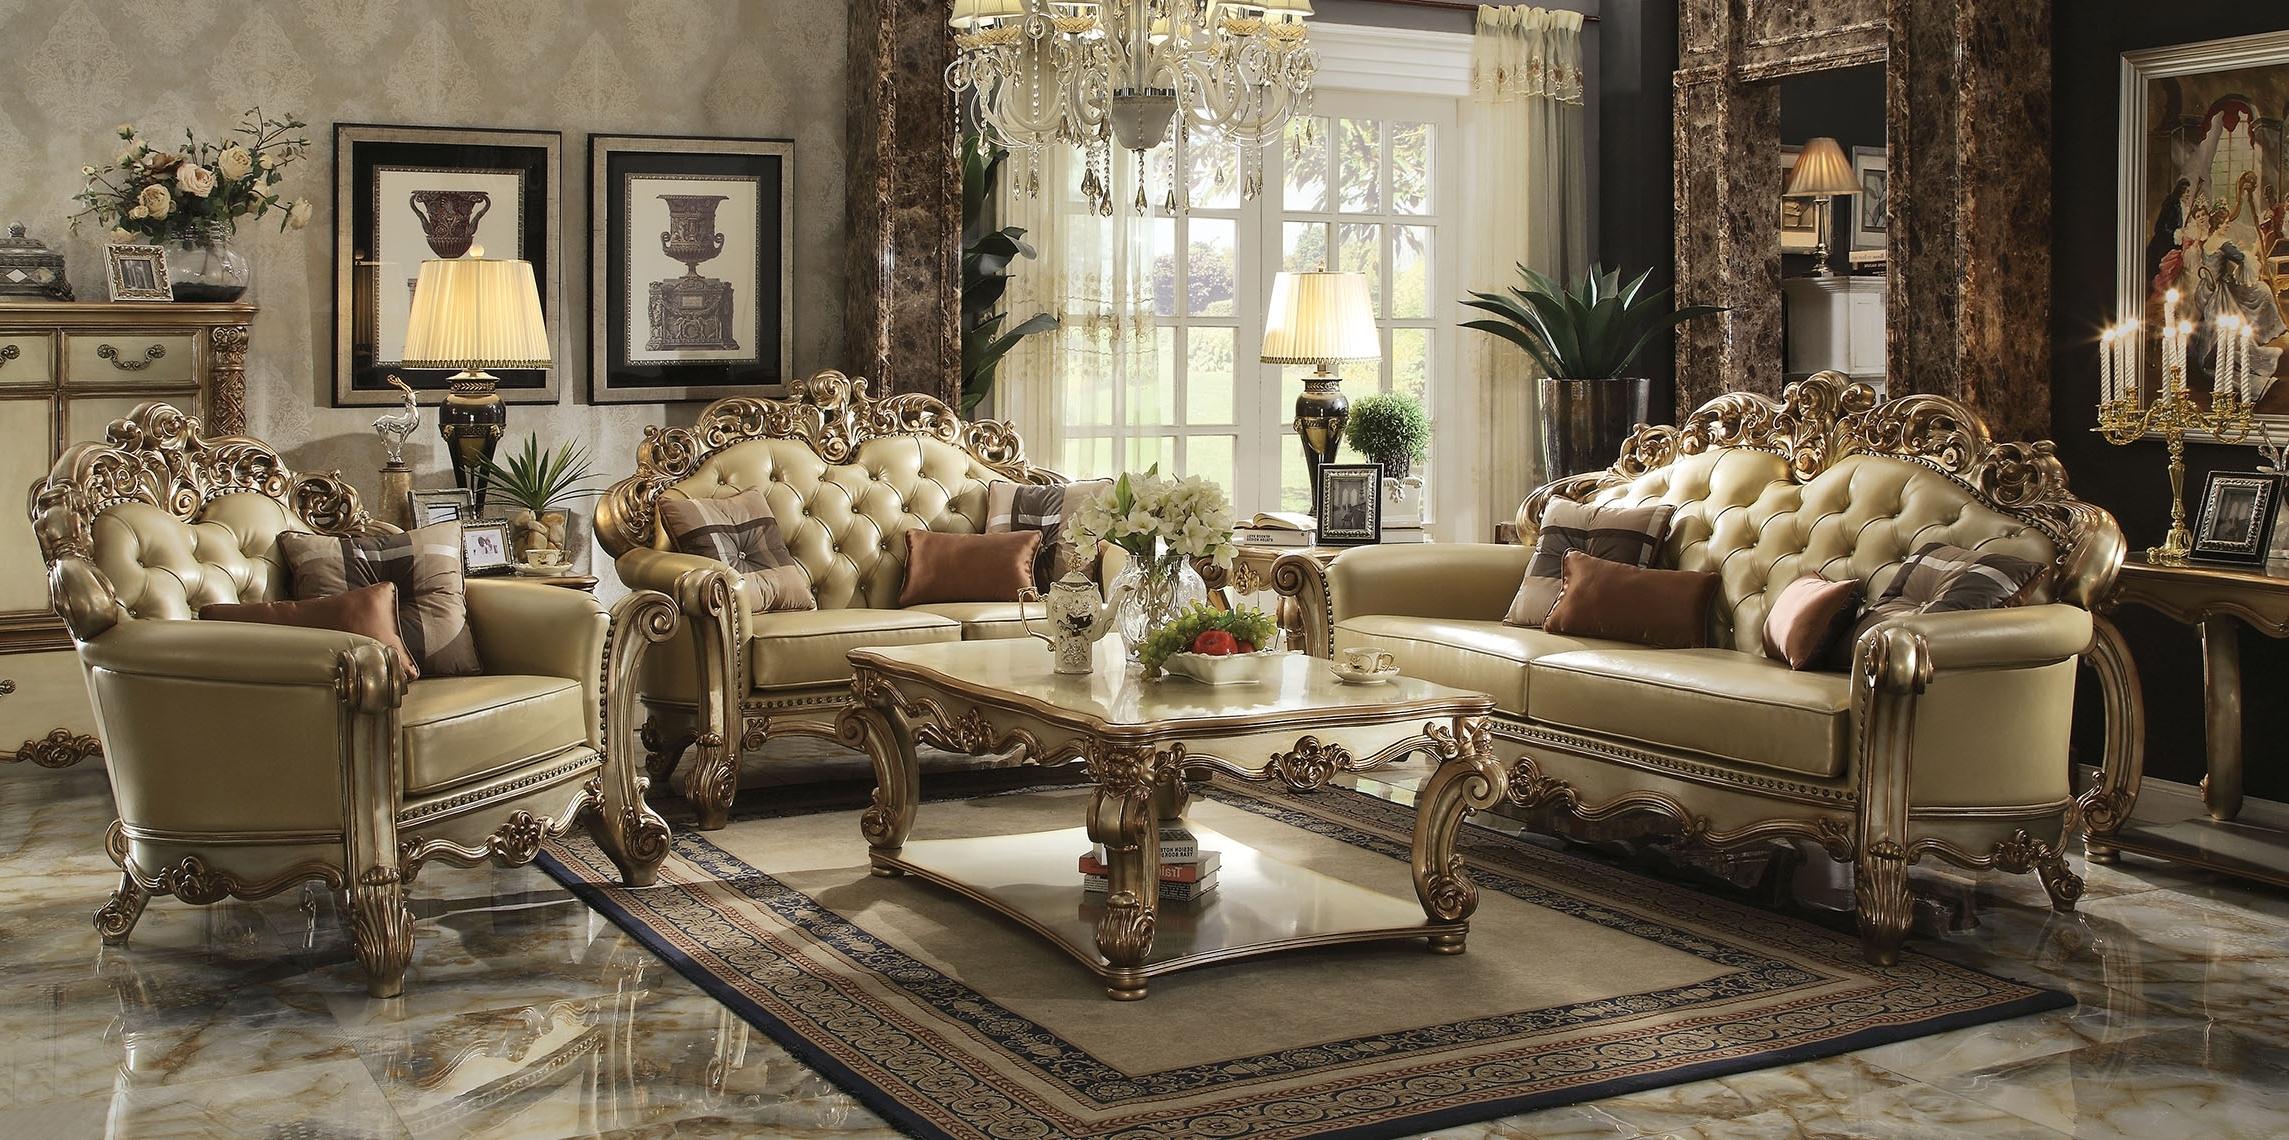 Preferred Classic Sofa Set (View 15 of 20)